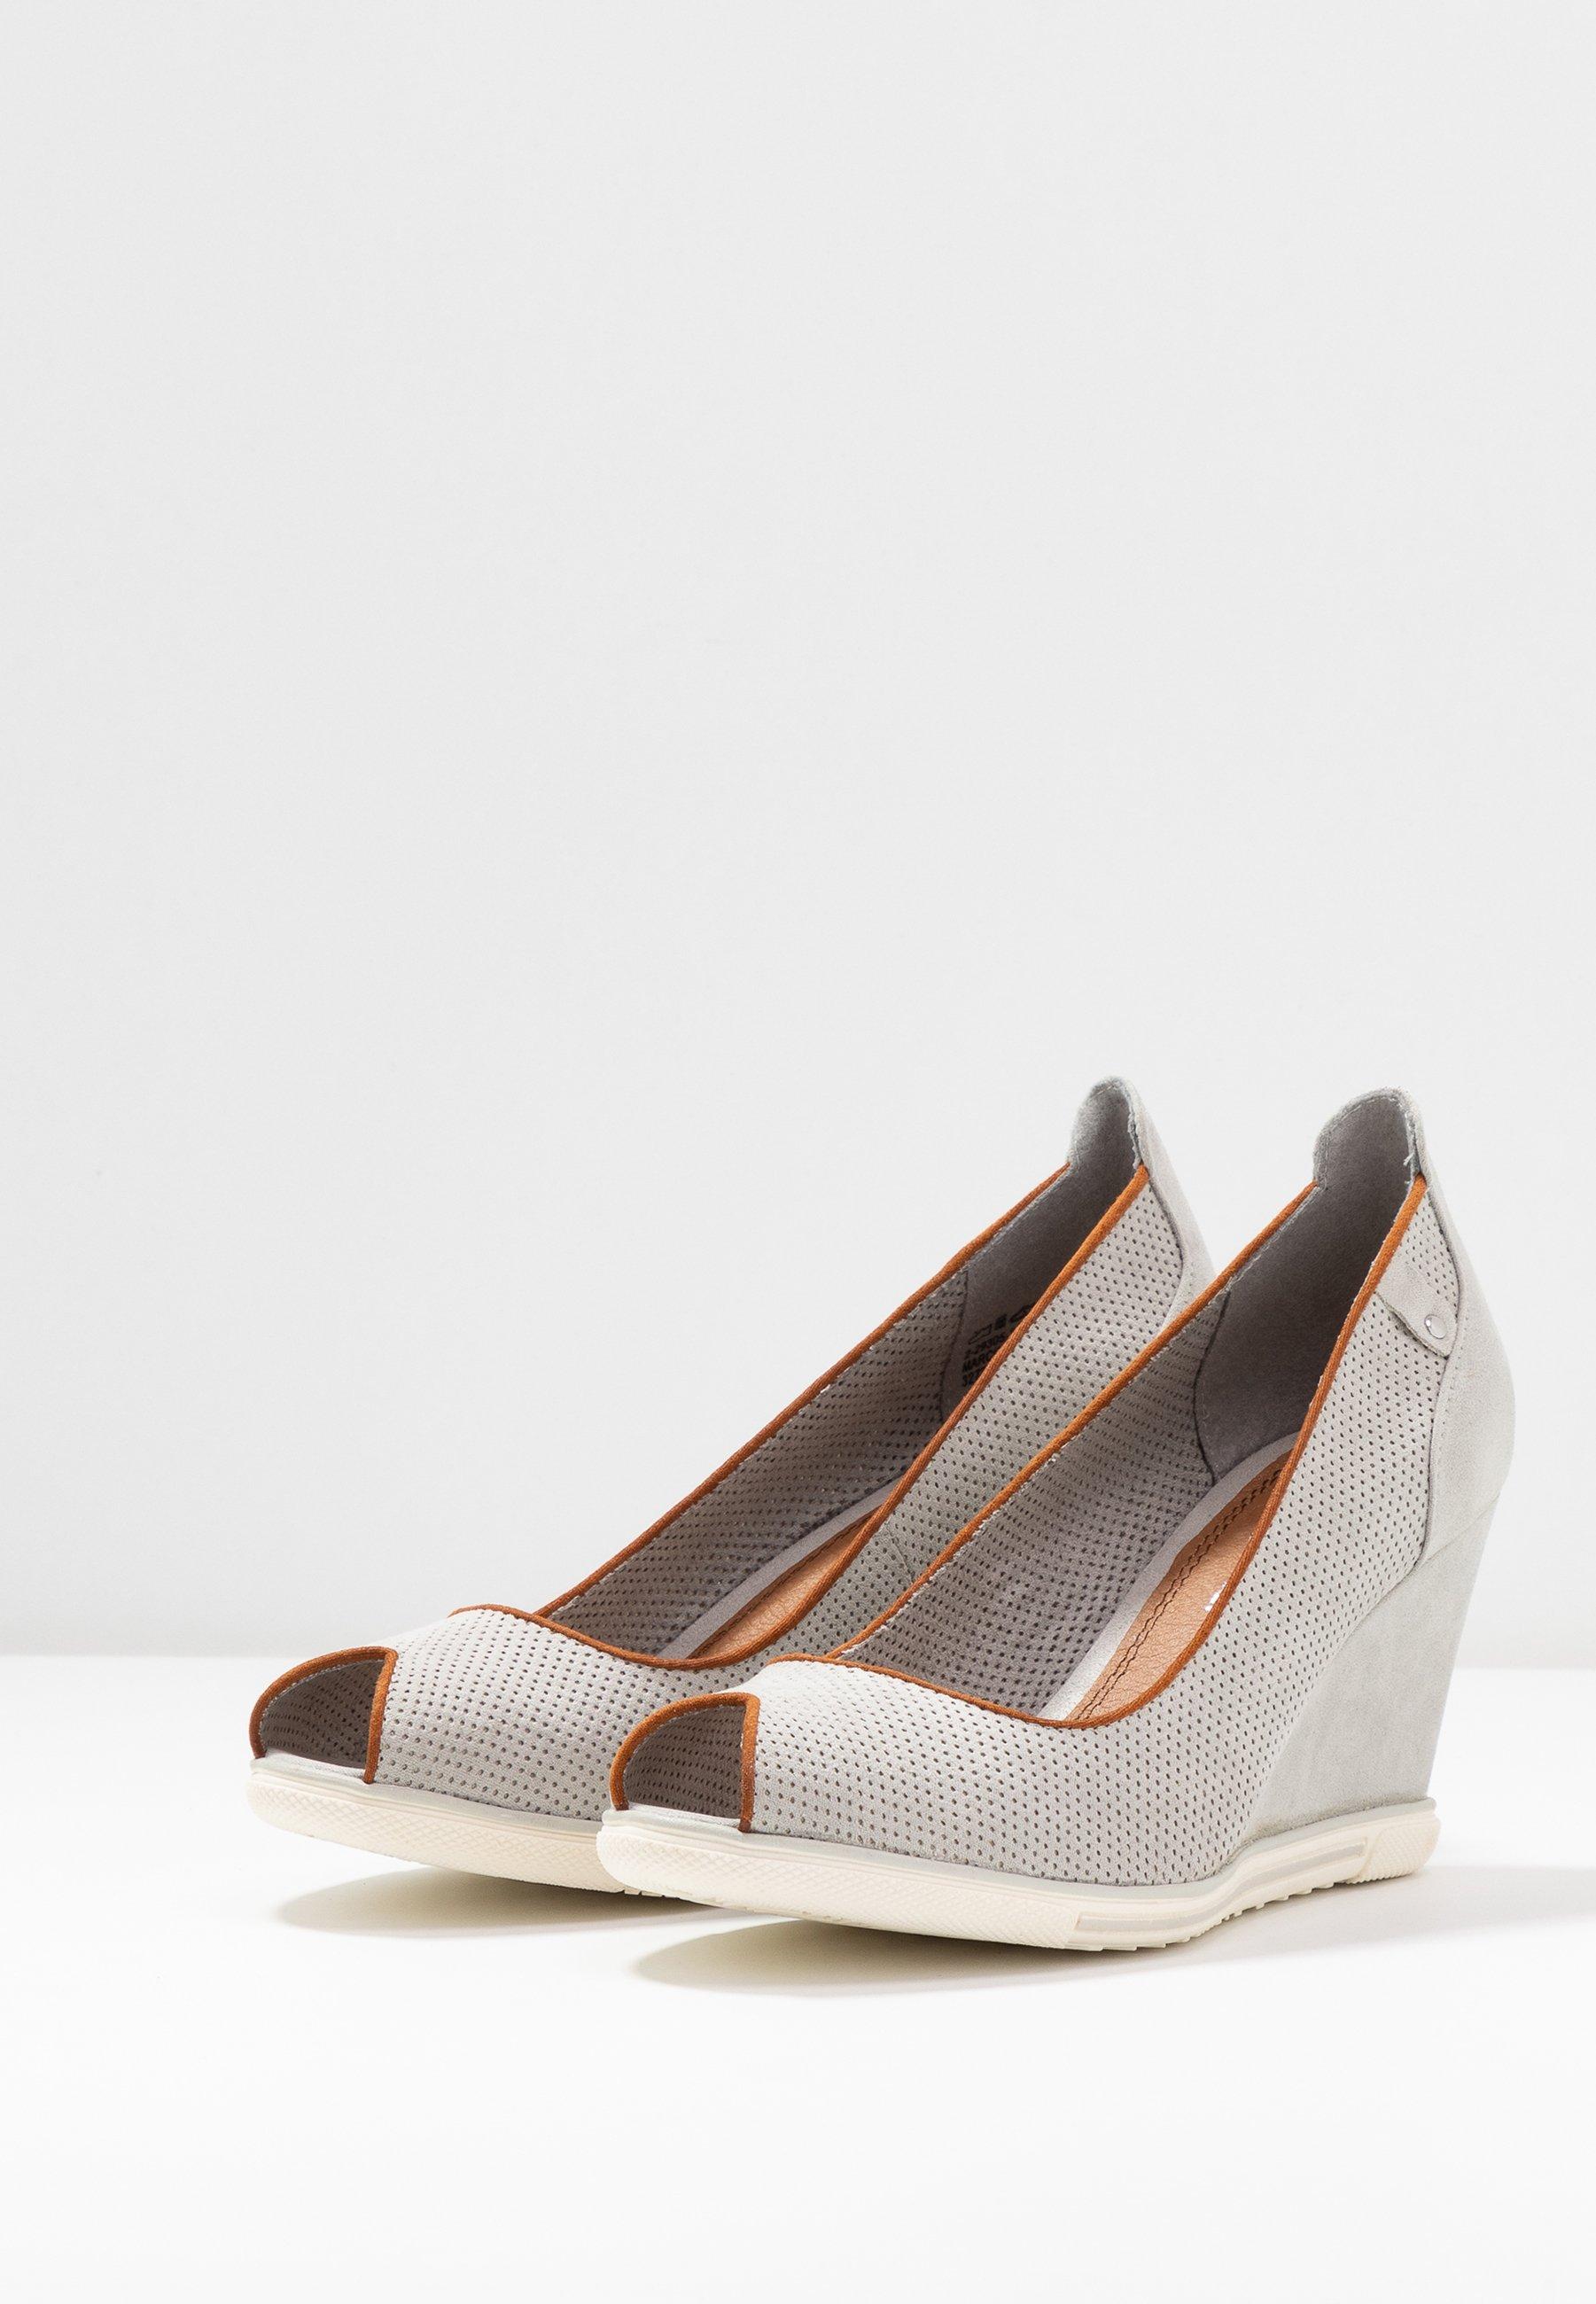 Marco Tozzi Peep toes - grey